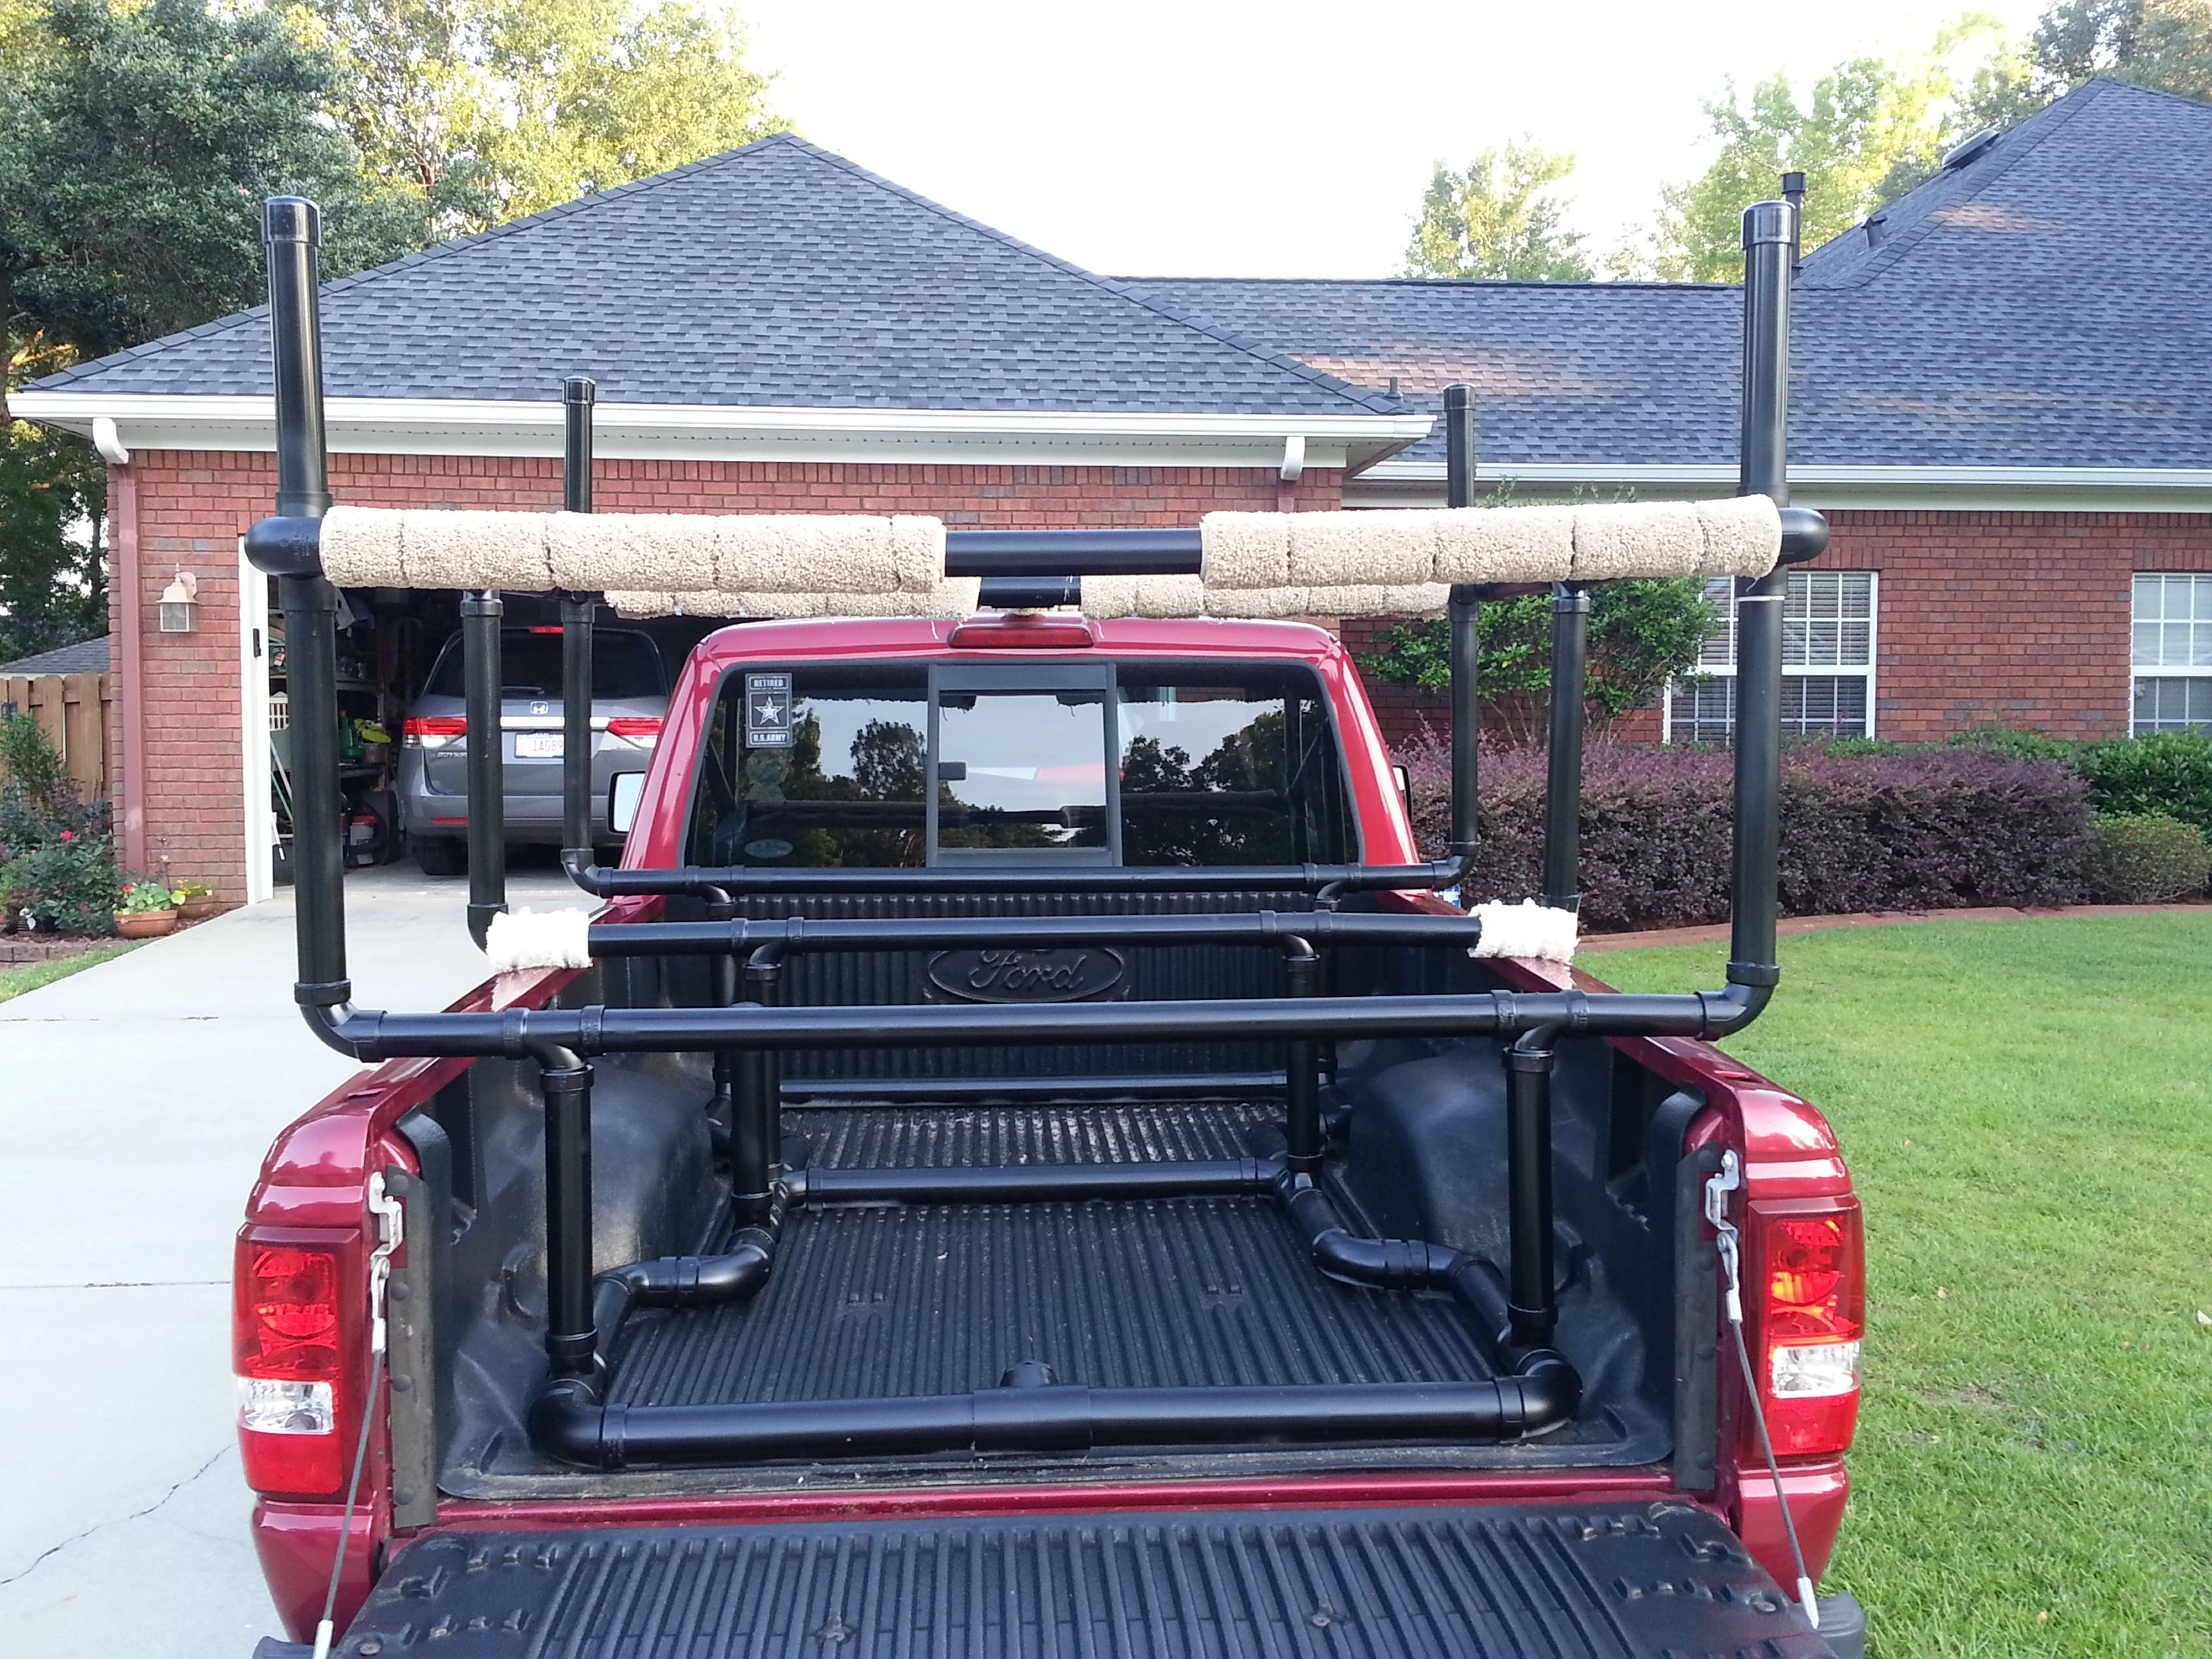 Best 25 Kayak Truck Rack Ideas On Pinterest Kayak Rack For Truck Diy Kayak Fishing